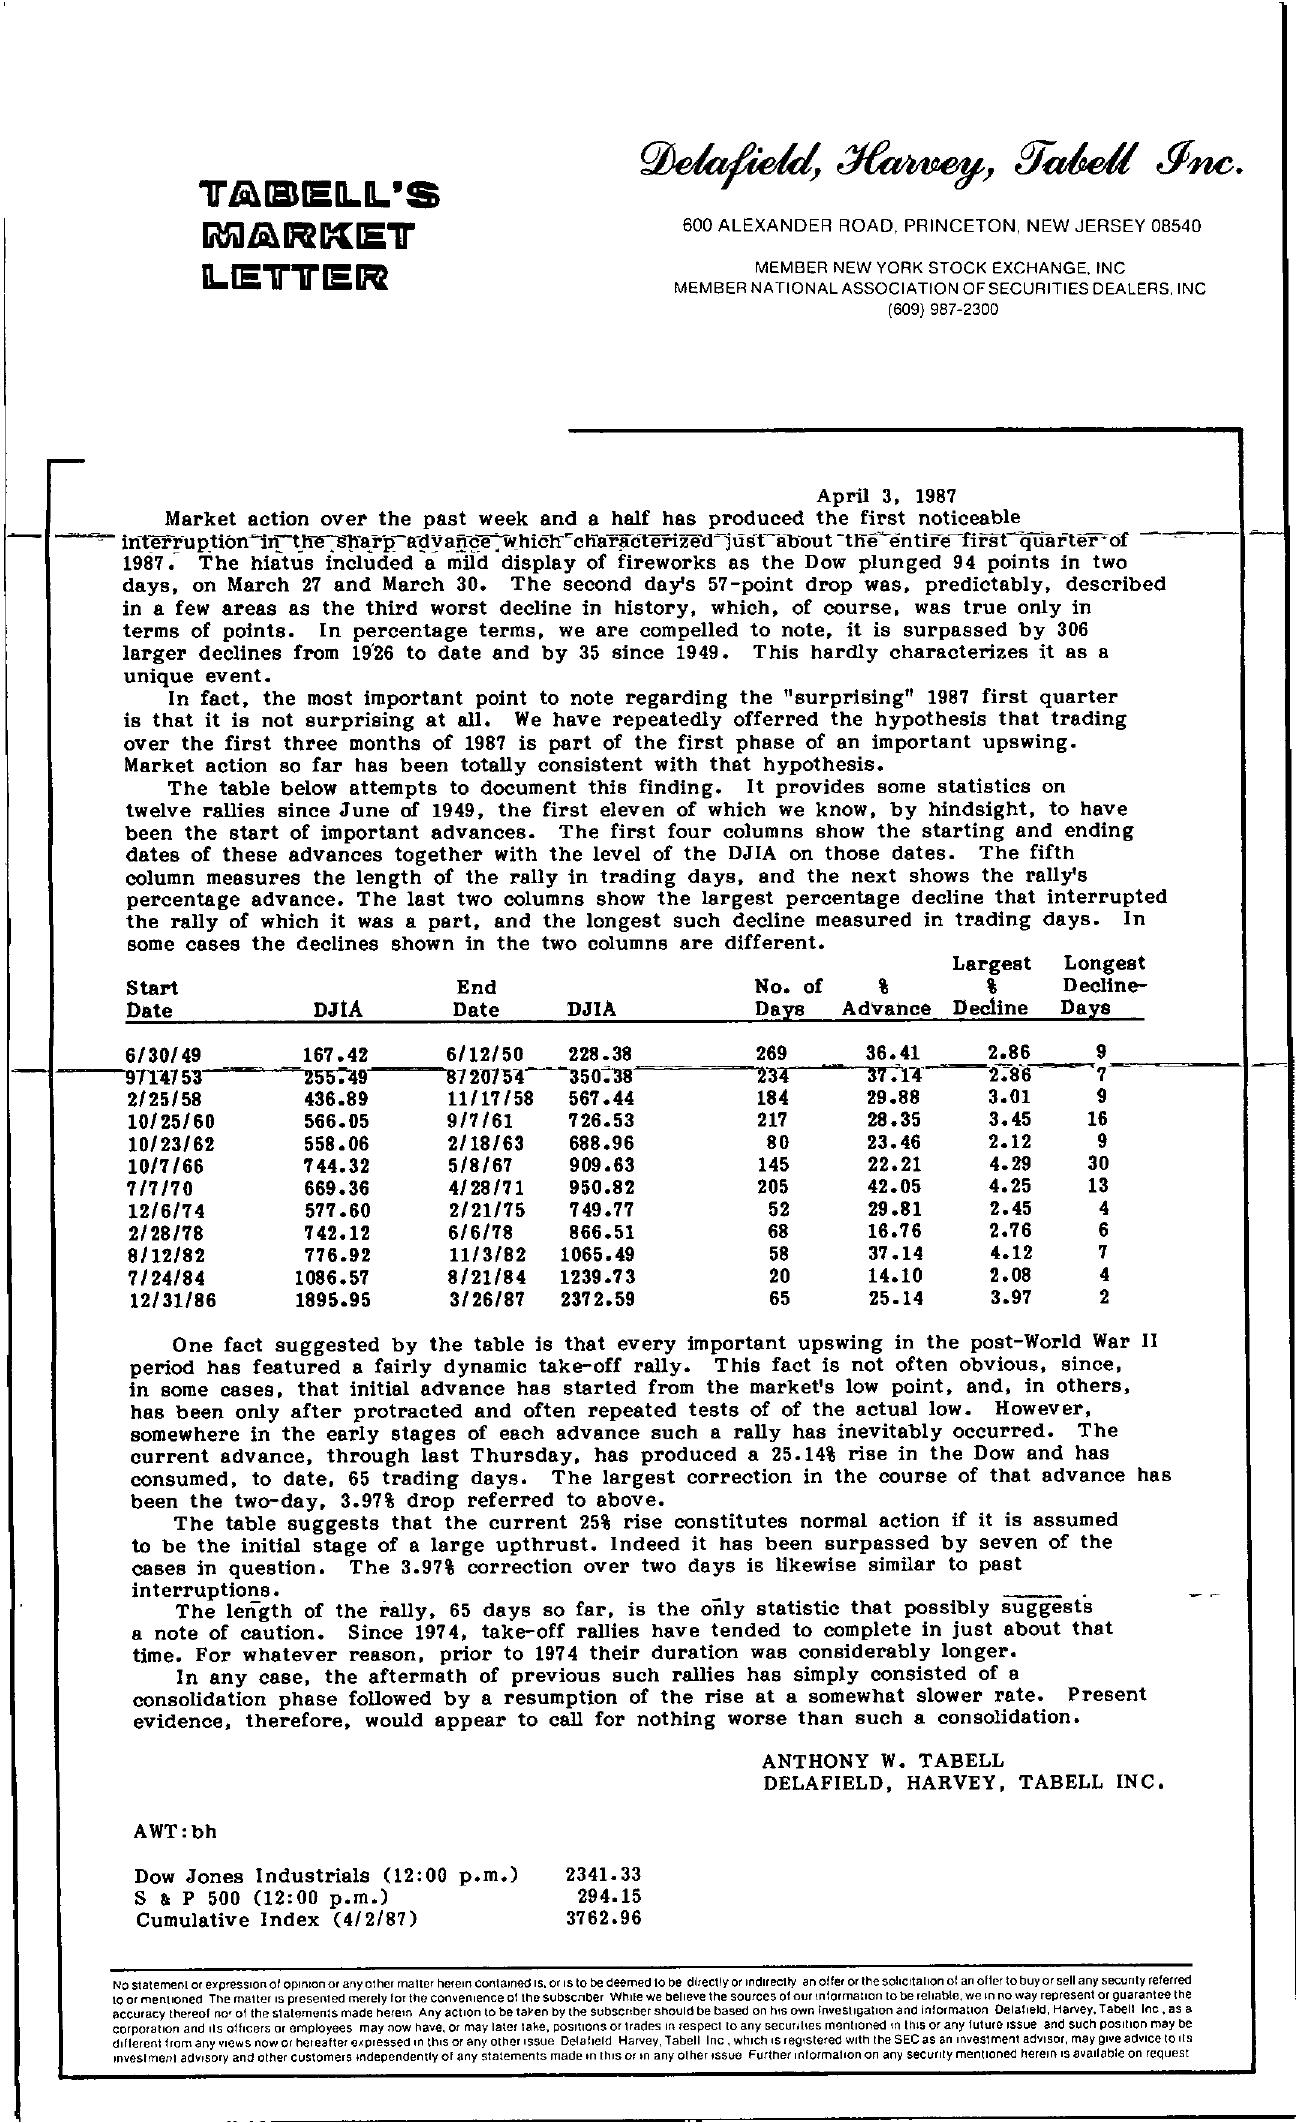 Tabell's Market Letter - April 03, 1987